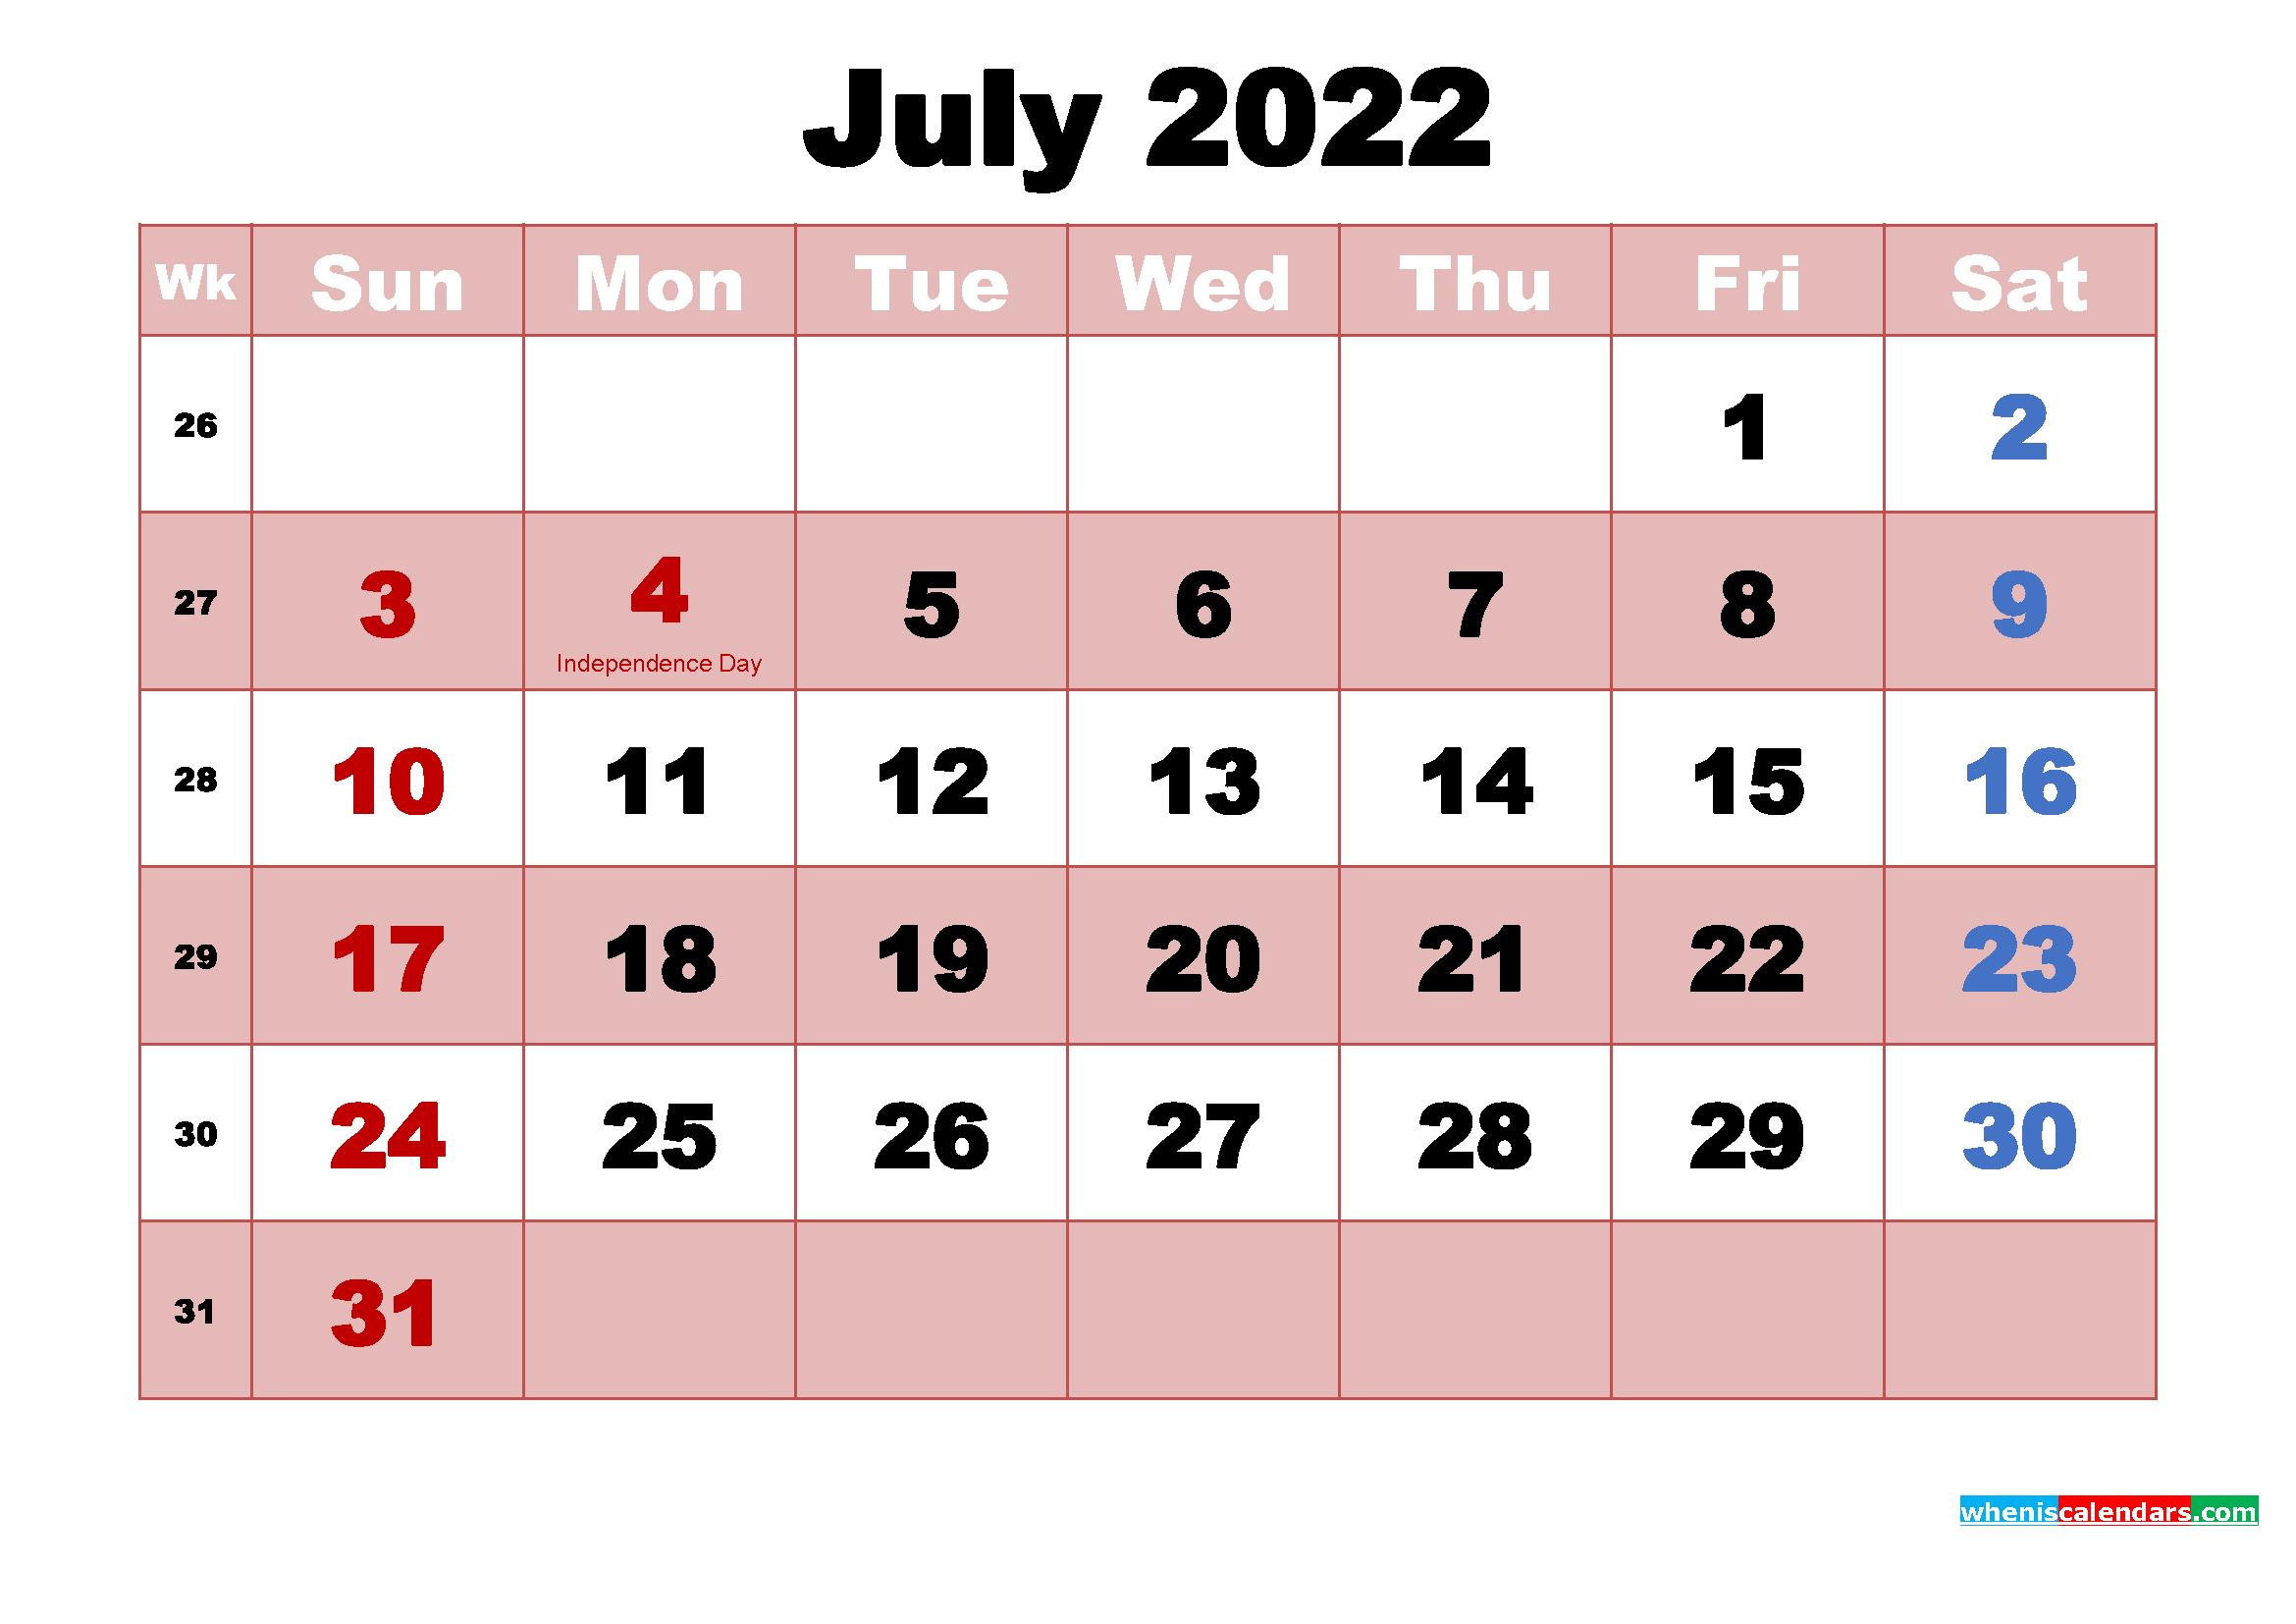 Free July 2022 Desktop Calendar High Resolution   Free inside Printable 2022 July Calendar Image